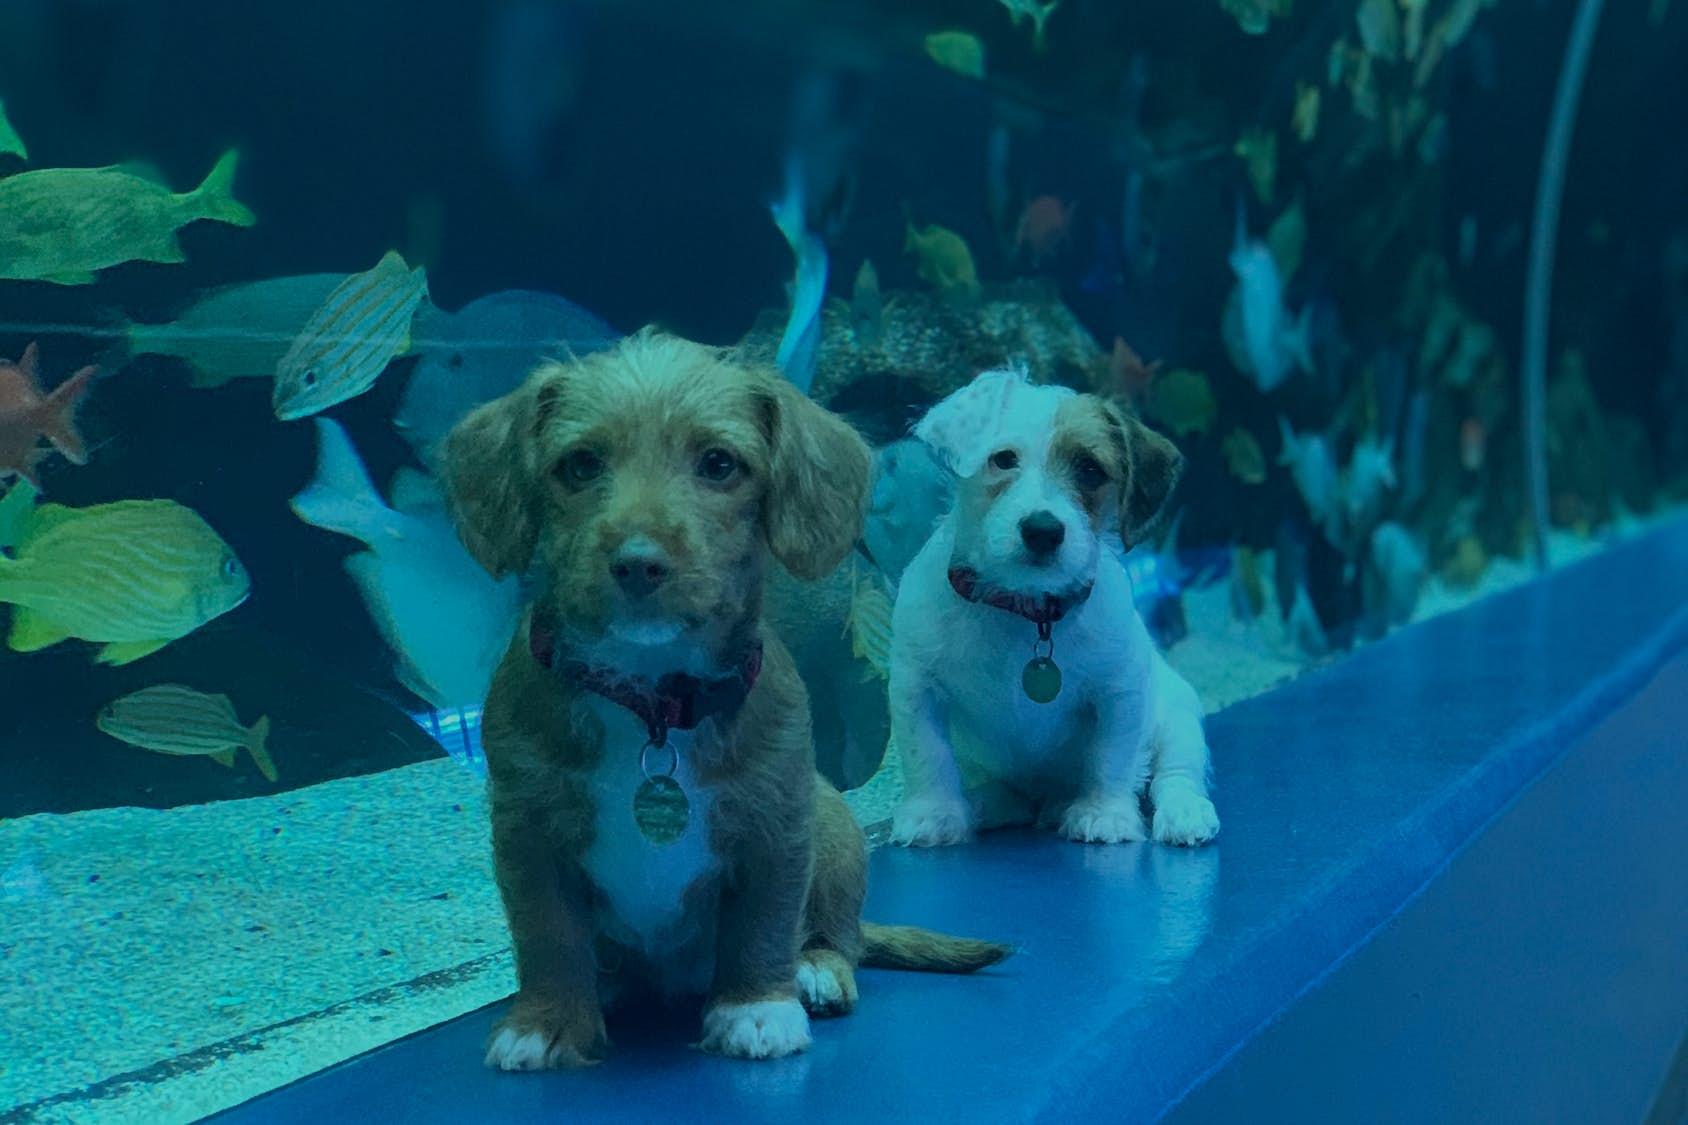 These puppies went on an underwater adventure at the Georgia Aquarium